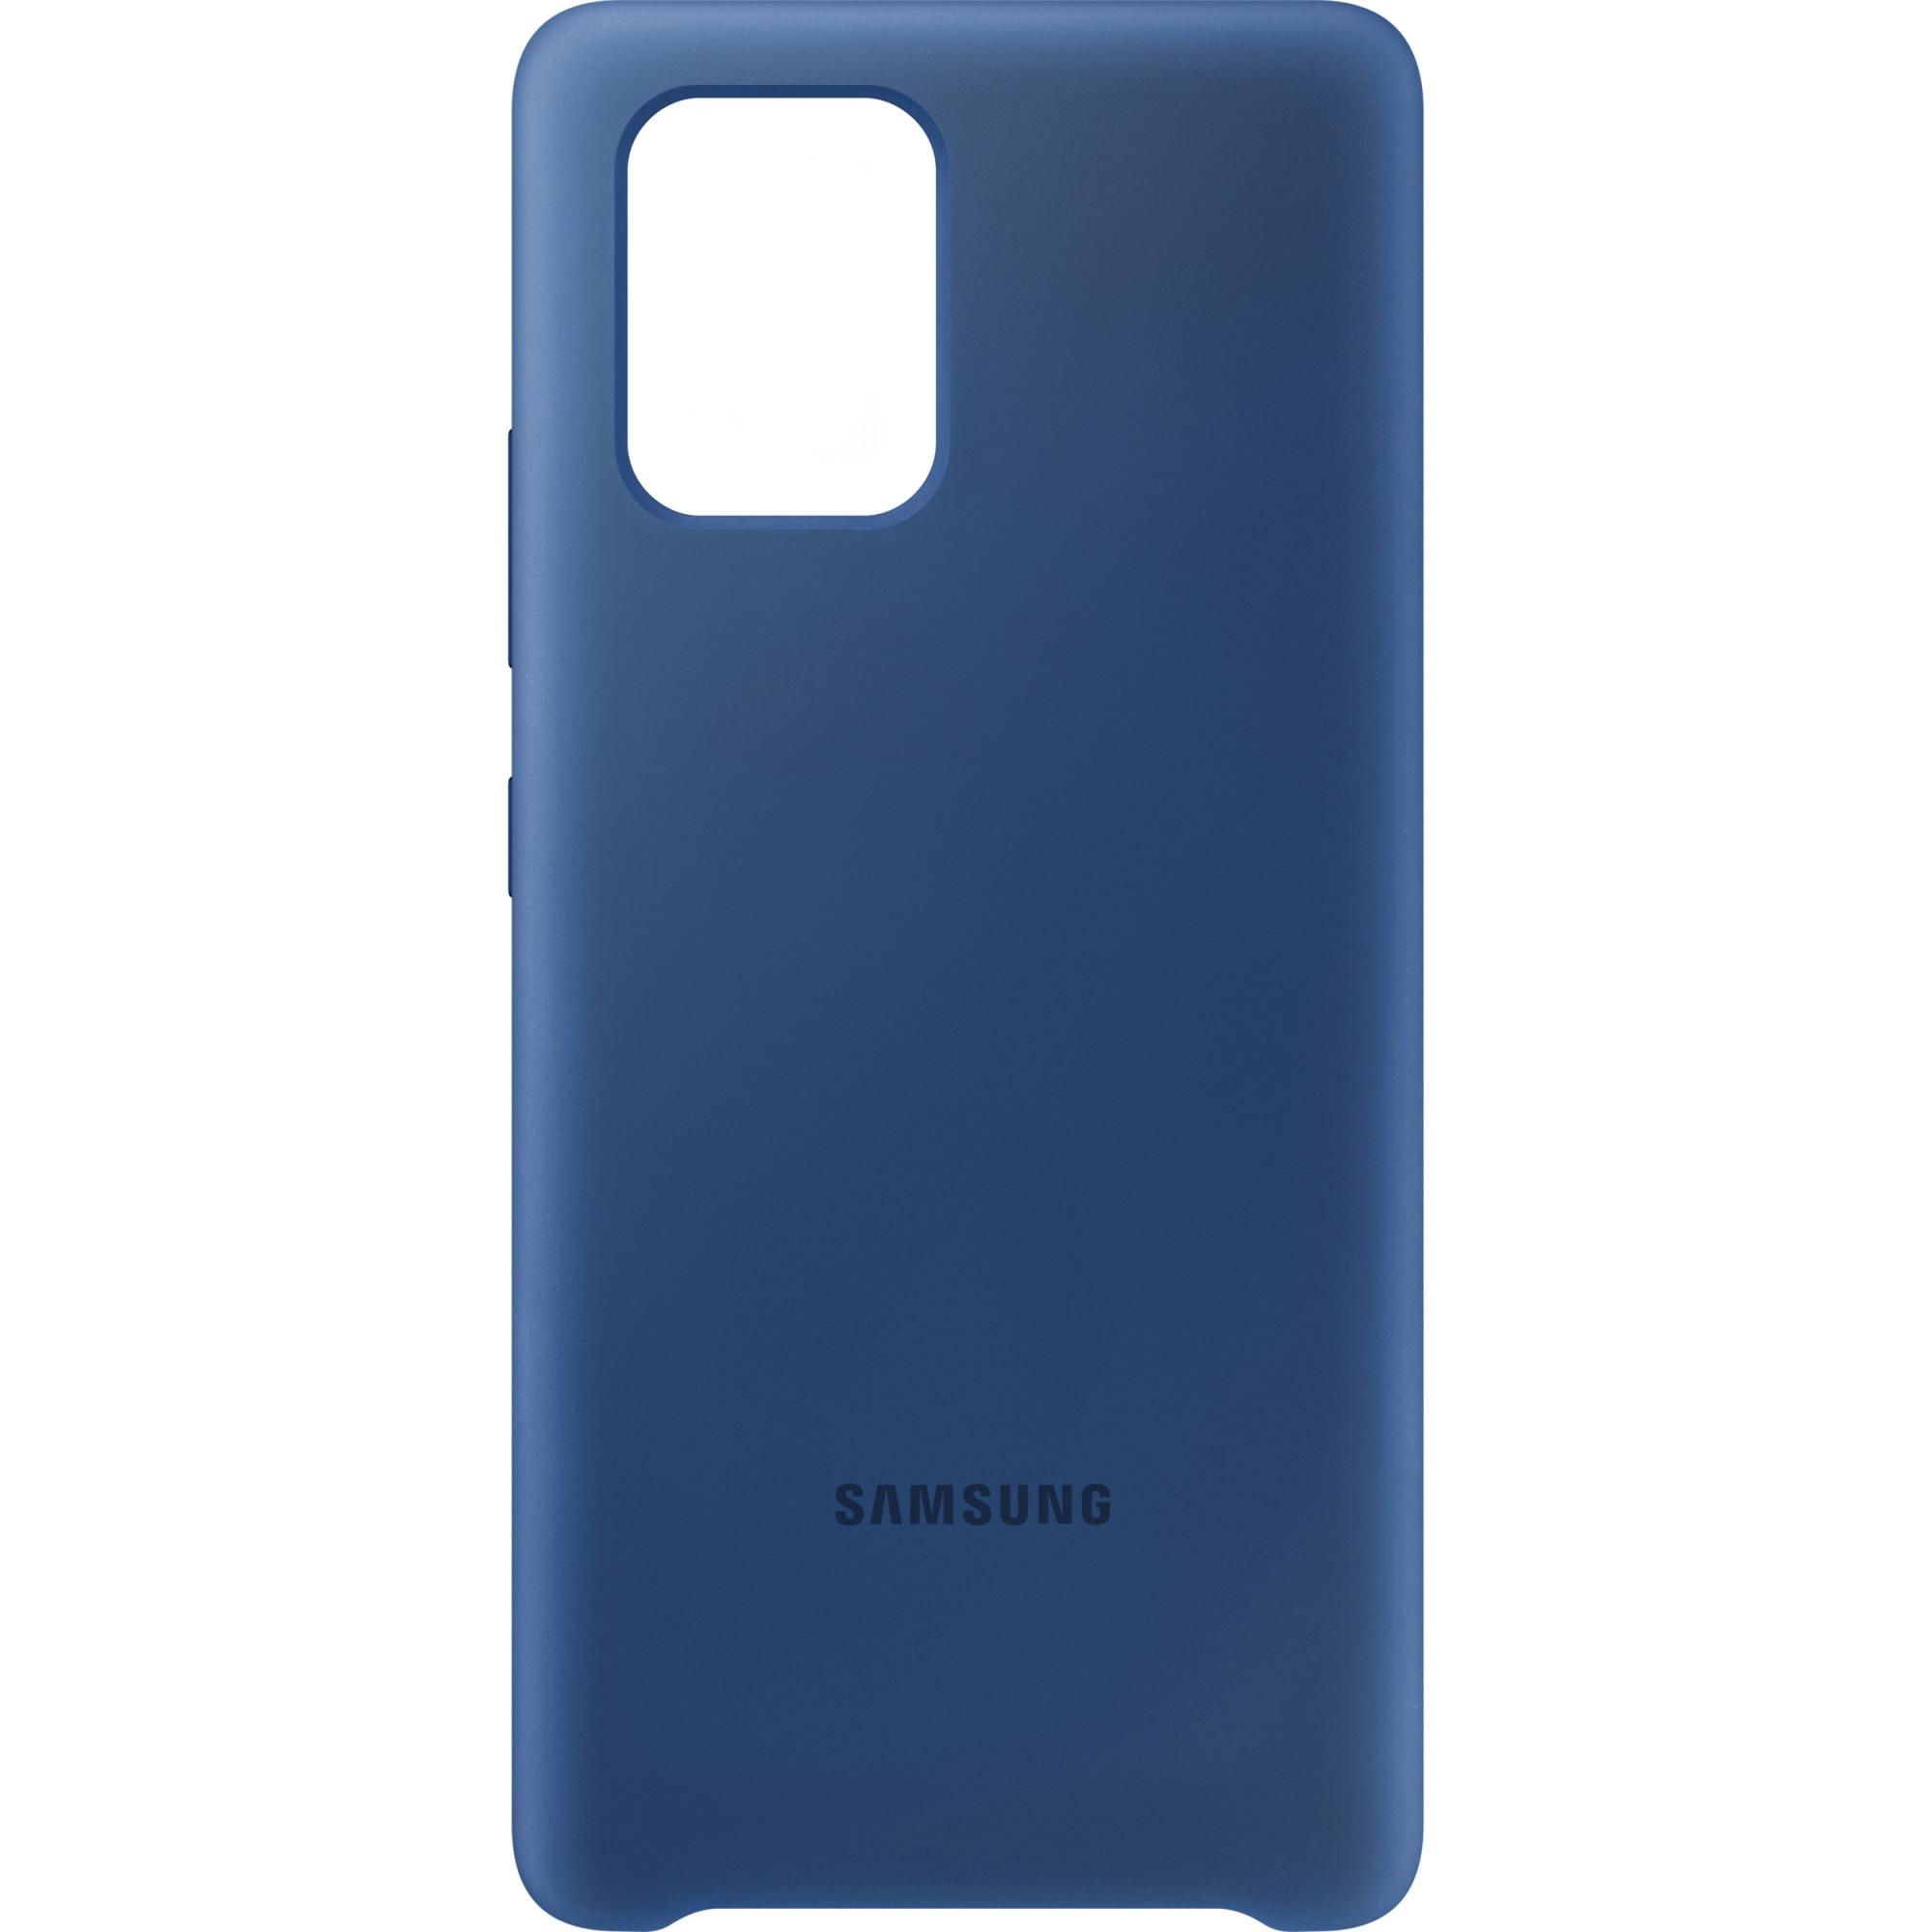 Fotografie Husa de protectie Samsung Silicone Cover pentru Galaxy S10 Lite, Blue